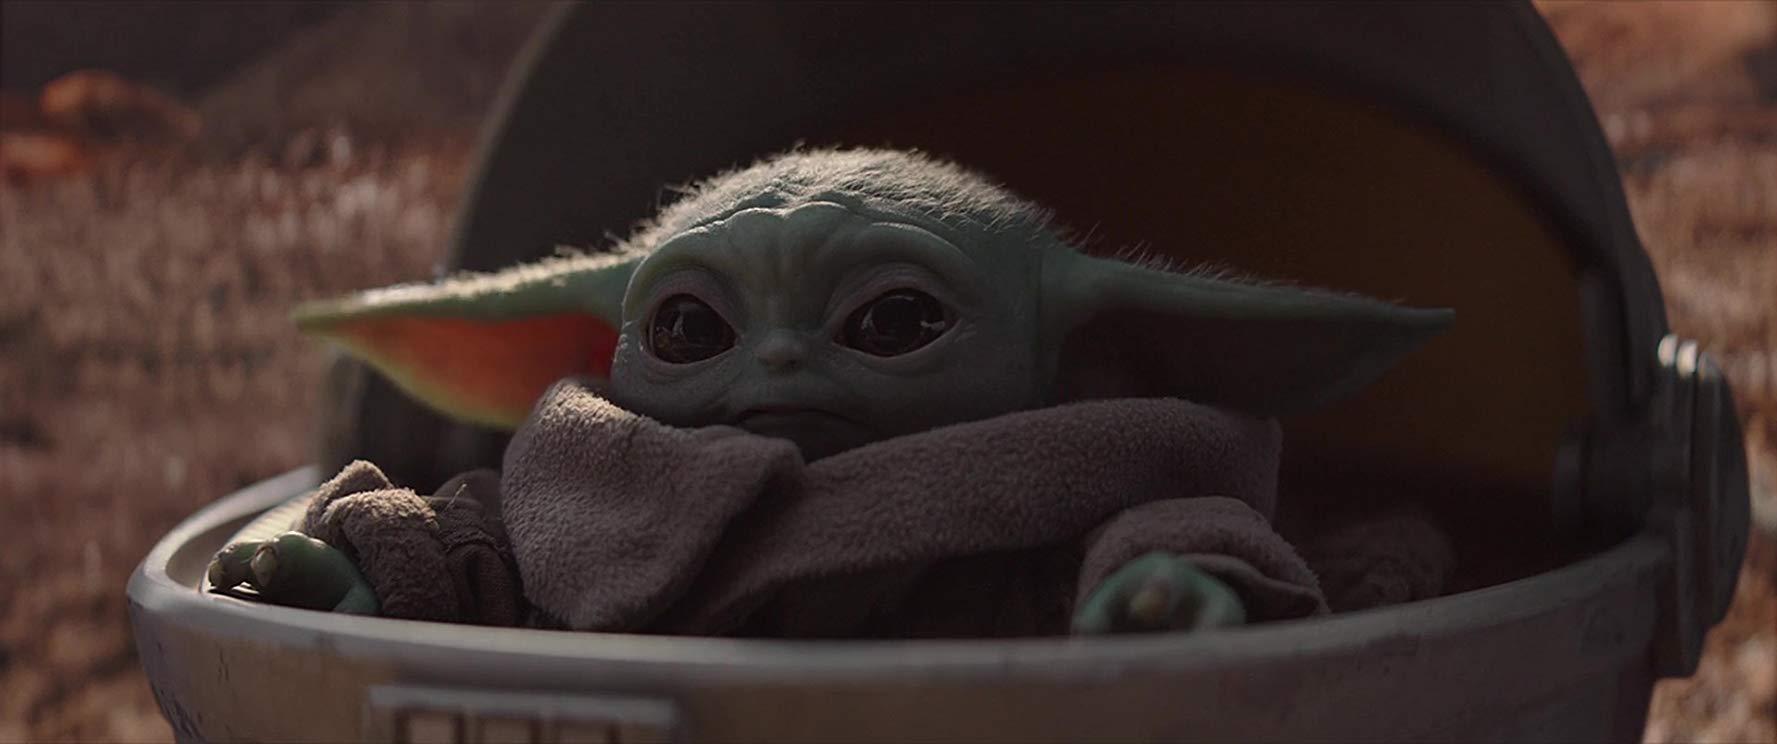 Сериал Мандалорец 2 серия маленький Йода